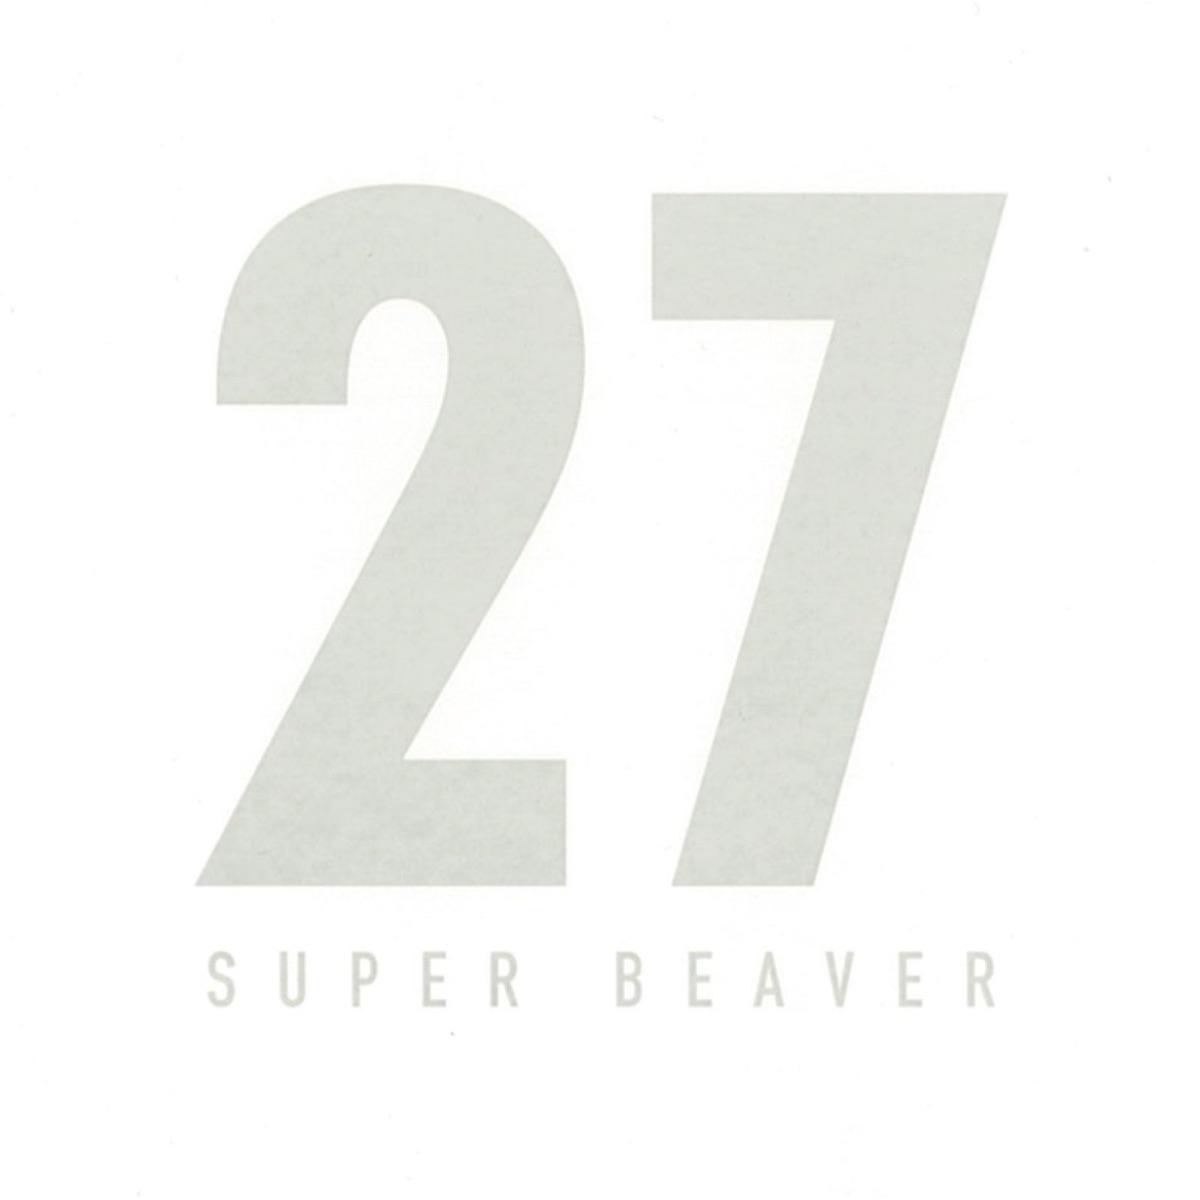 『SUPER BEAVER - 人として 歌詞』収録の『27』ジャケット